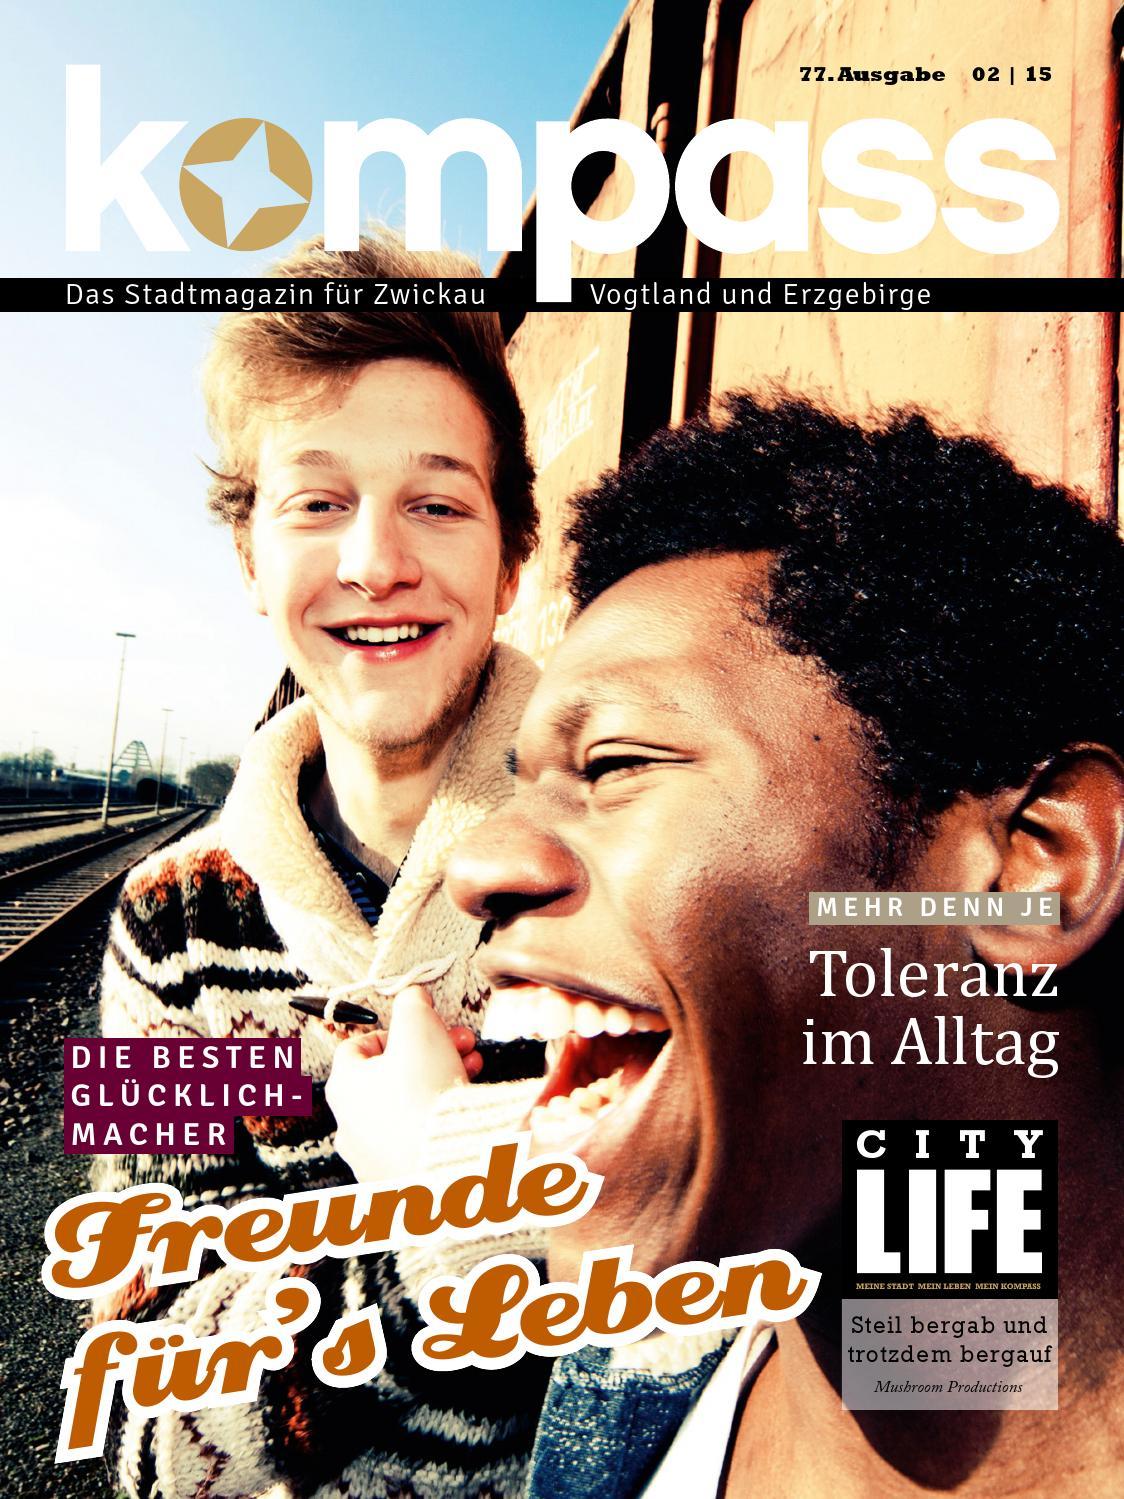 KOMPASS Stadtmagazin Ausgabe 02 | 15 by KOMPASS stadtmagazin - issuu